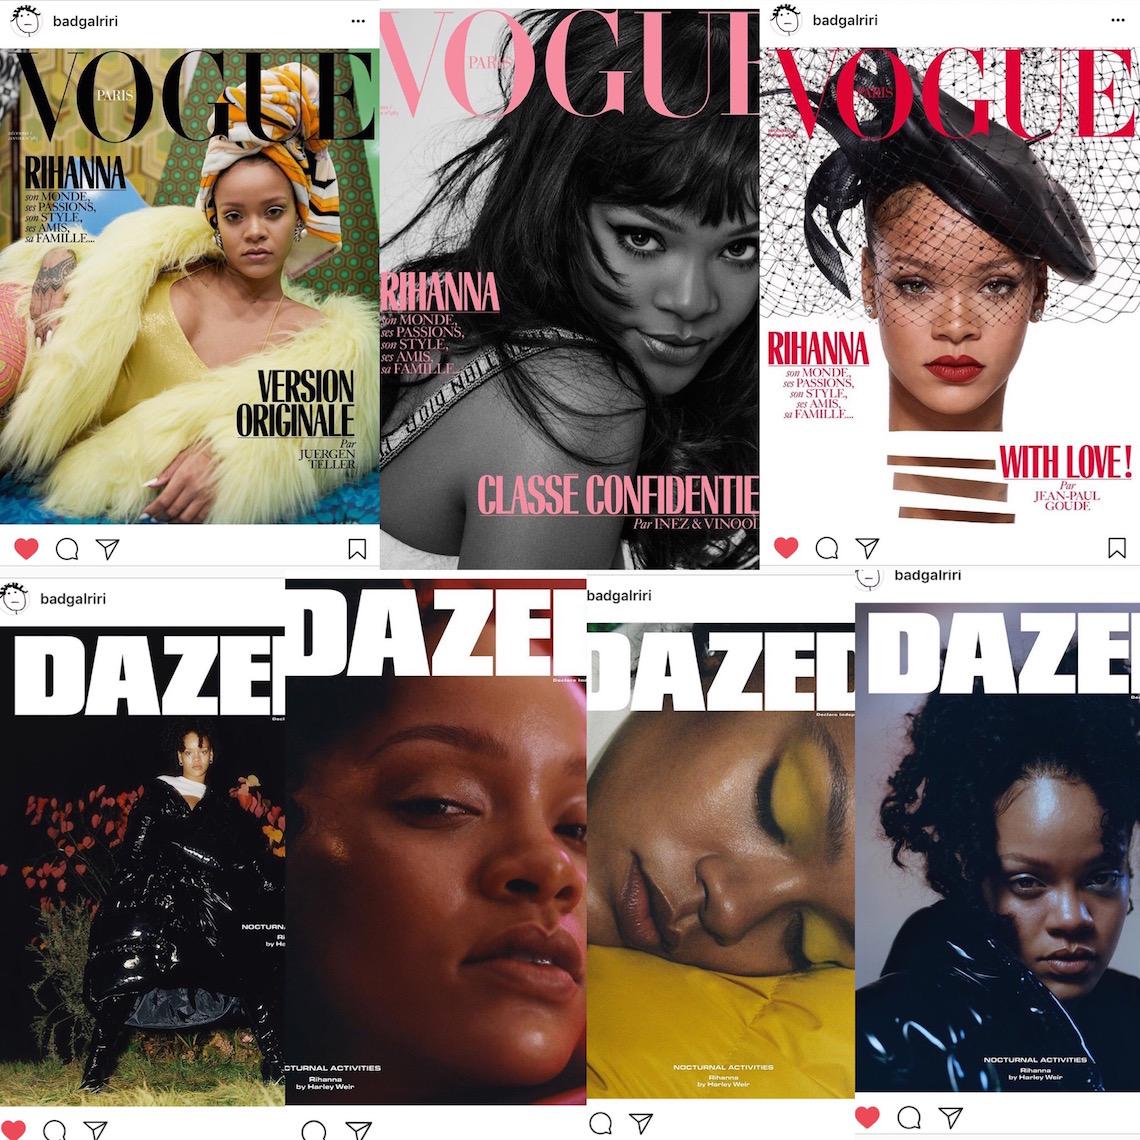 rihanna magazine covers-badgalriri screenshots